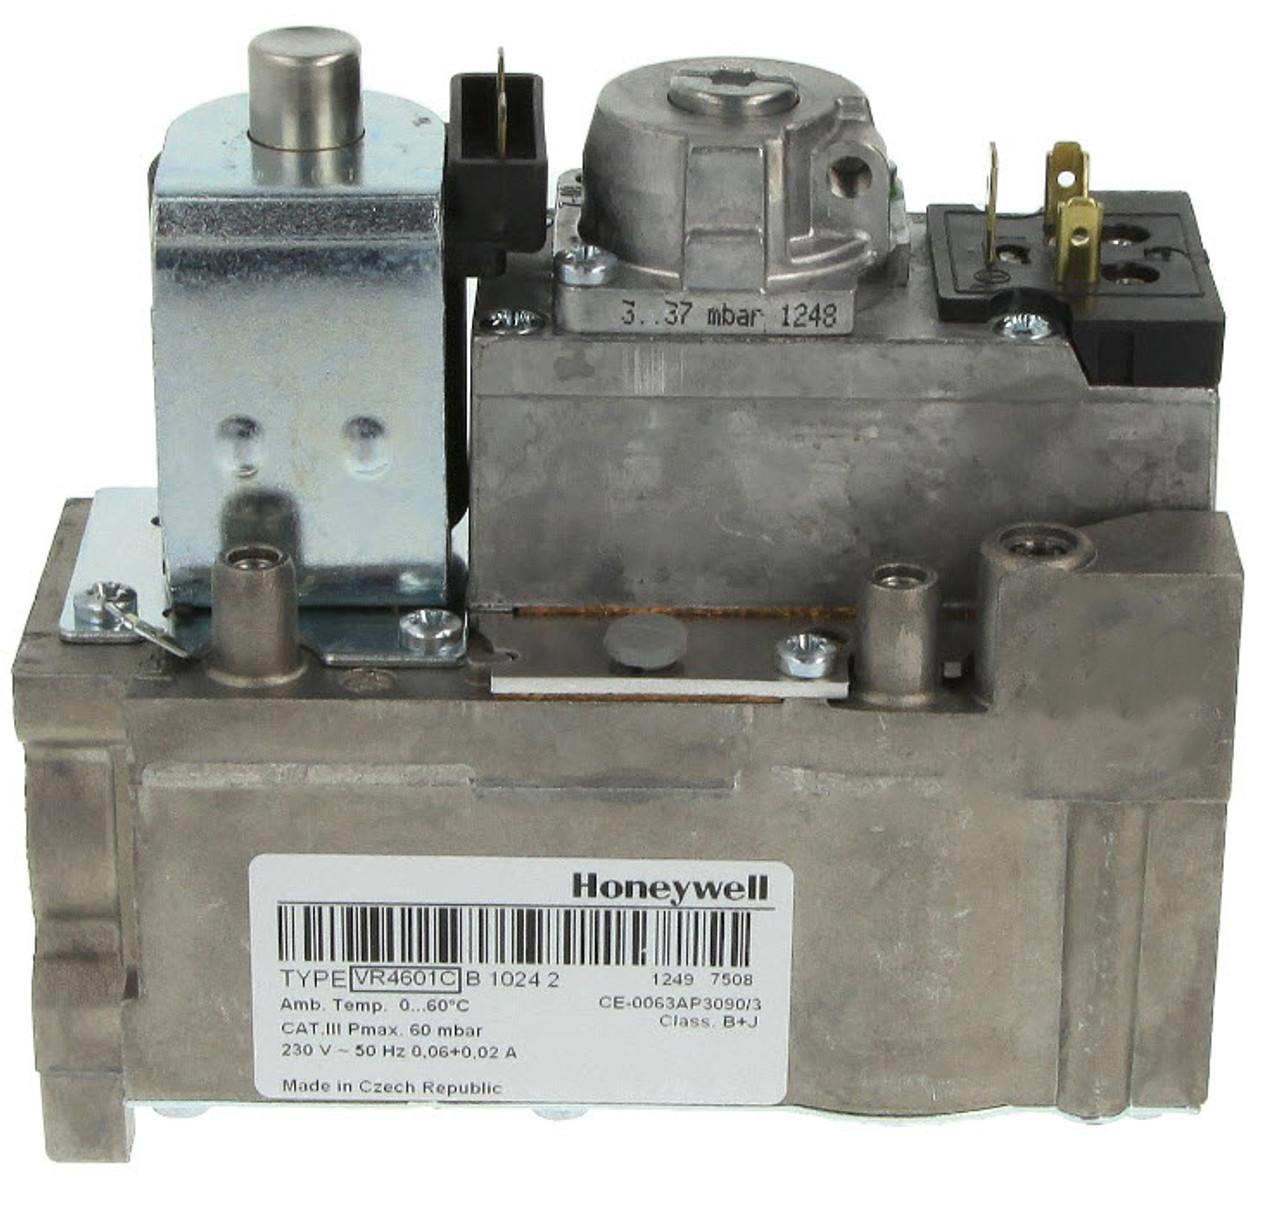 Honeywell VR4601CB1024U gas control block